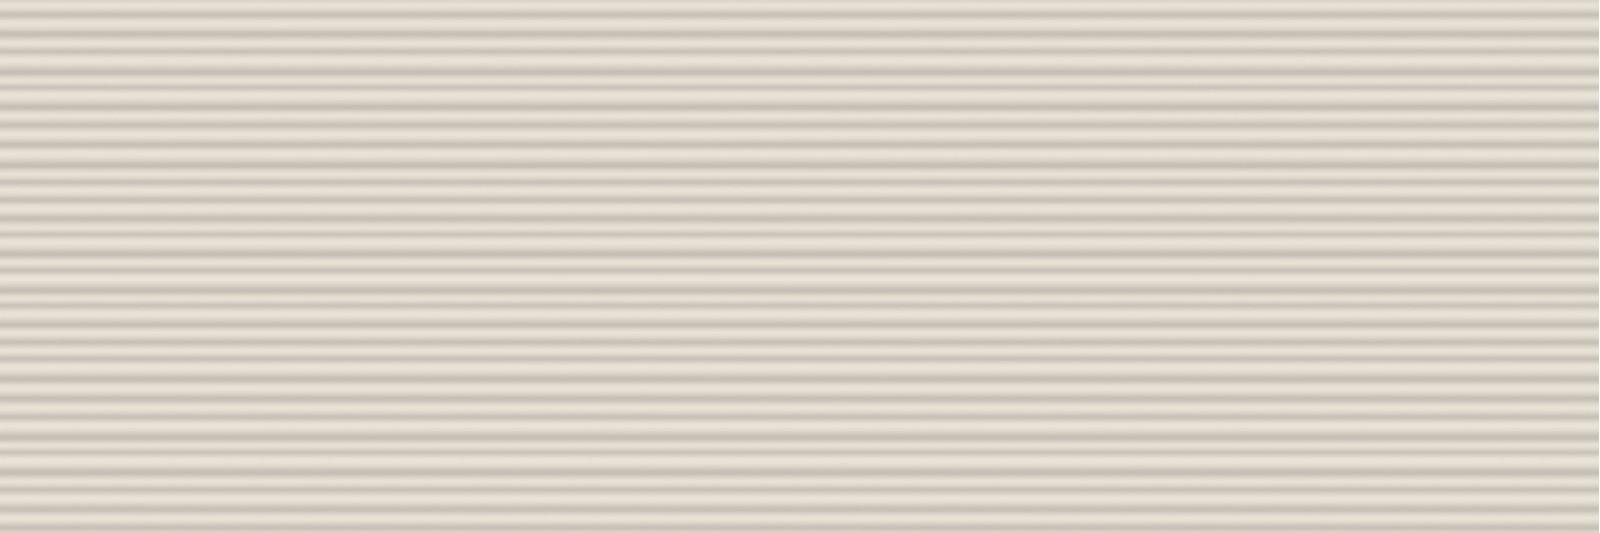 Стенни плочки Colorplay Cream Strutturata Mikado 3D 30x90